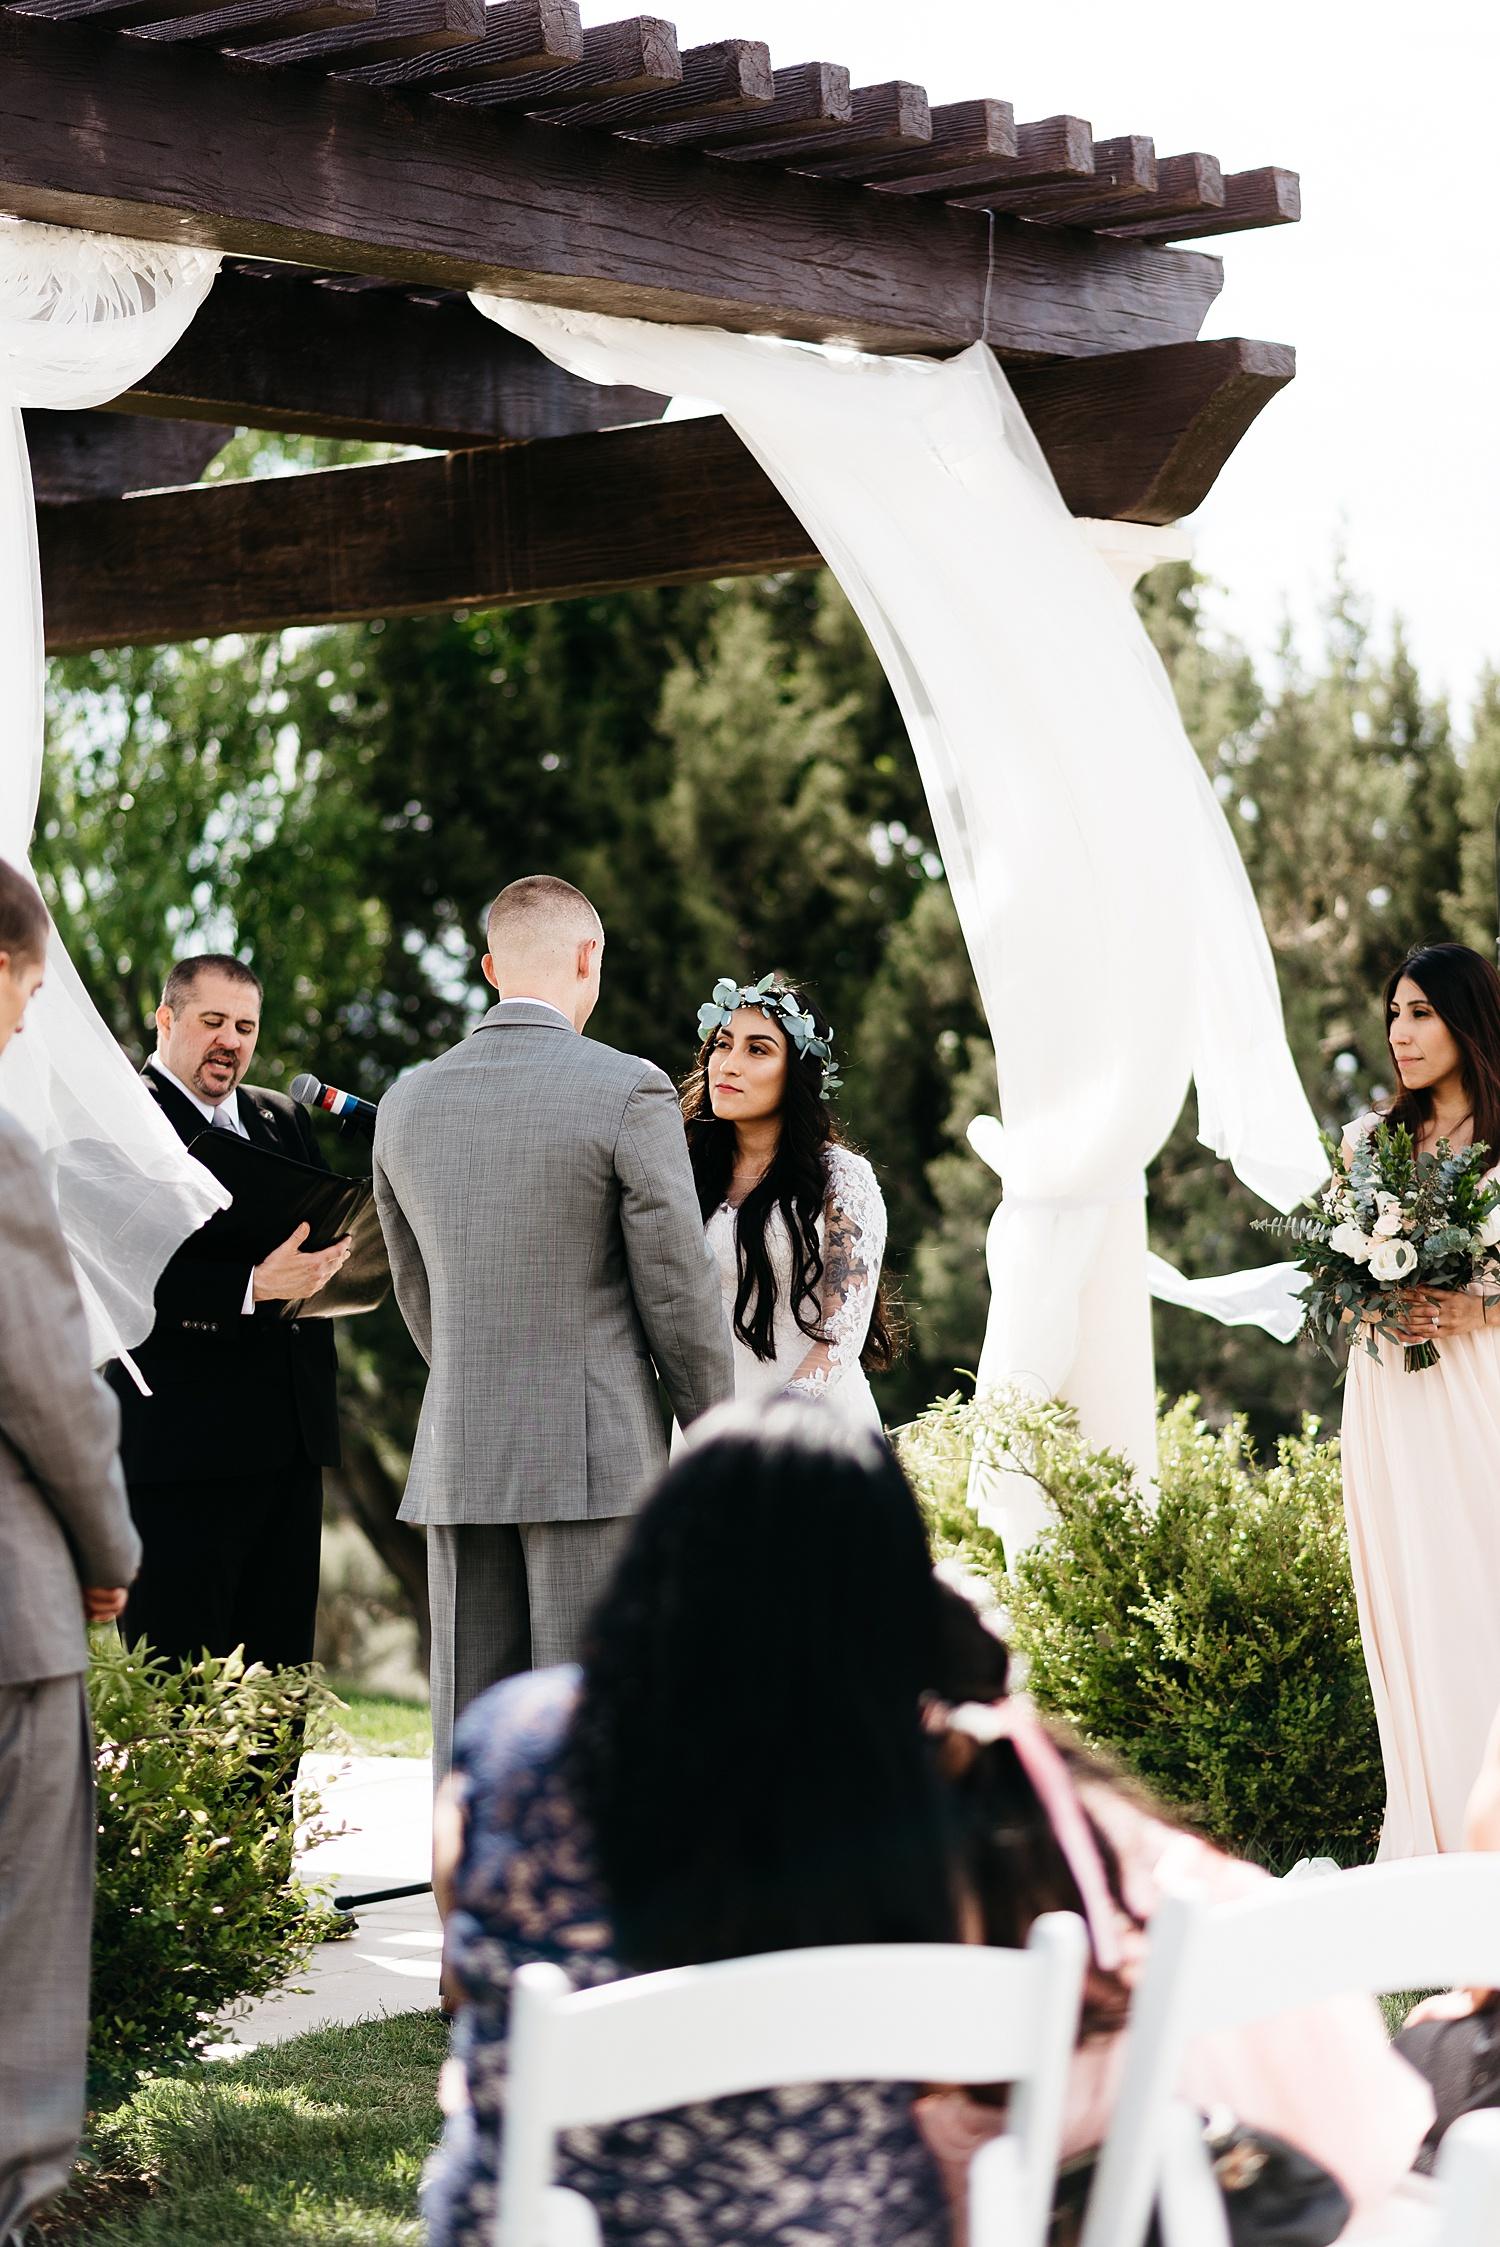 Zandra Barriga Photo - Darian and Colton Wedding_0026.jpg